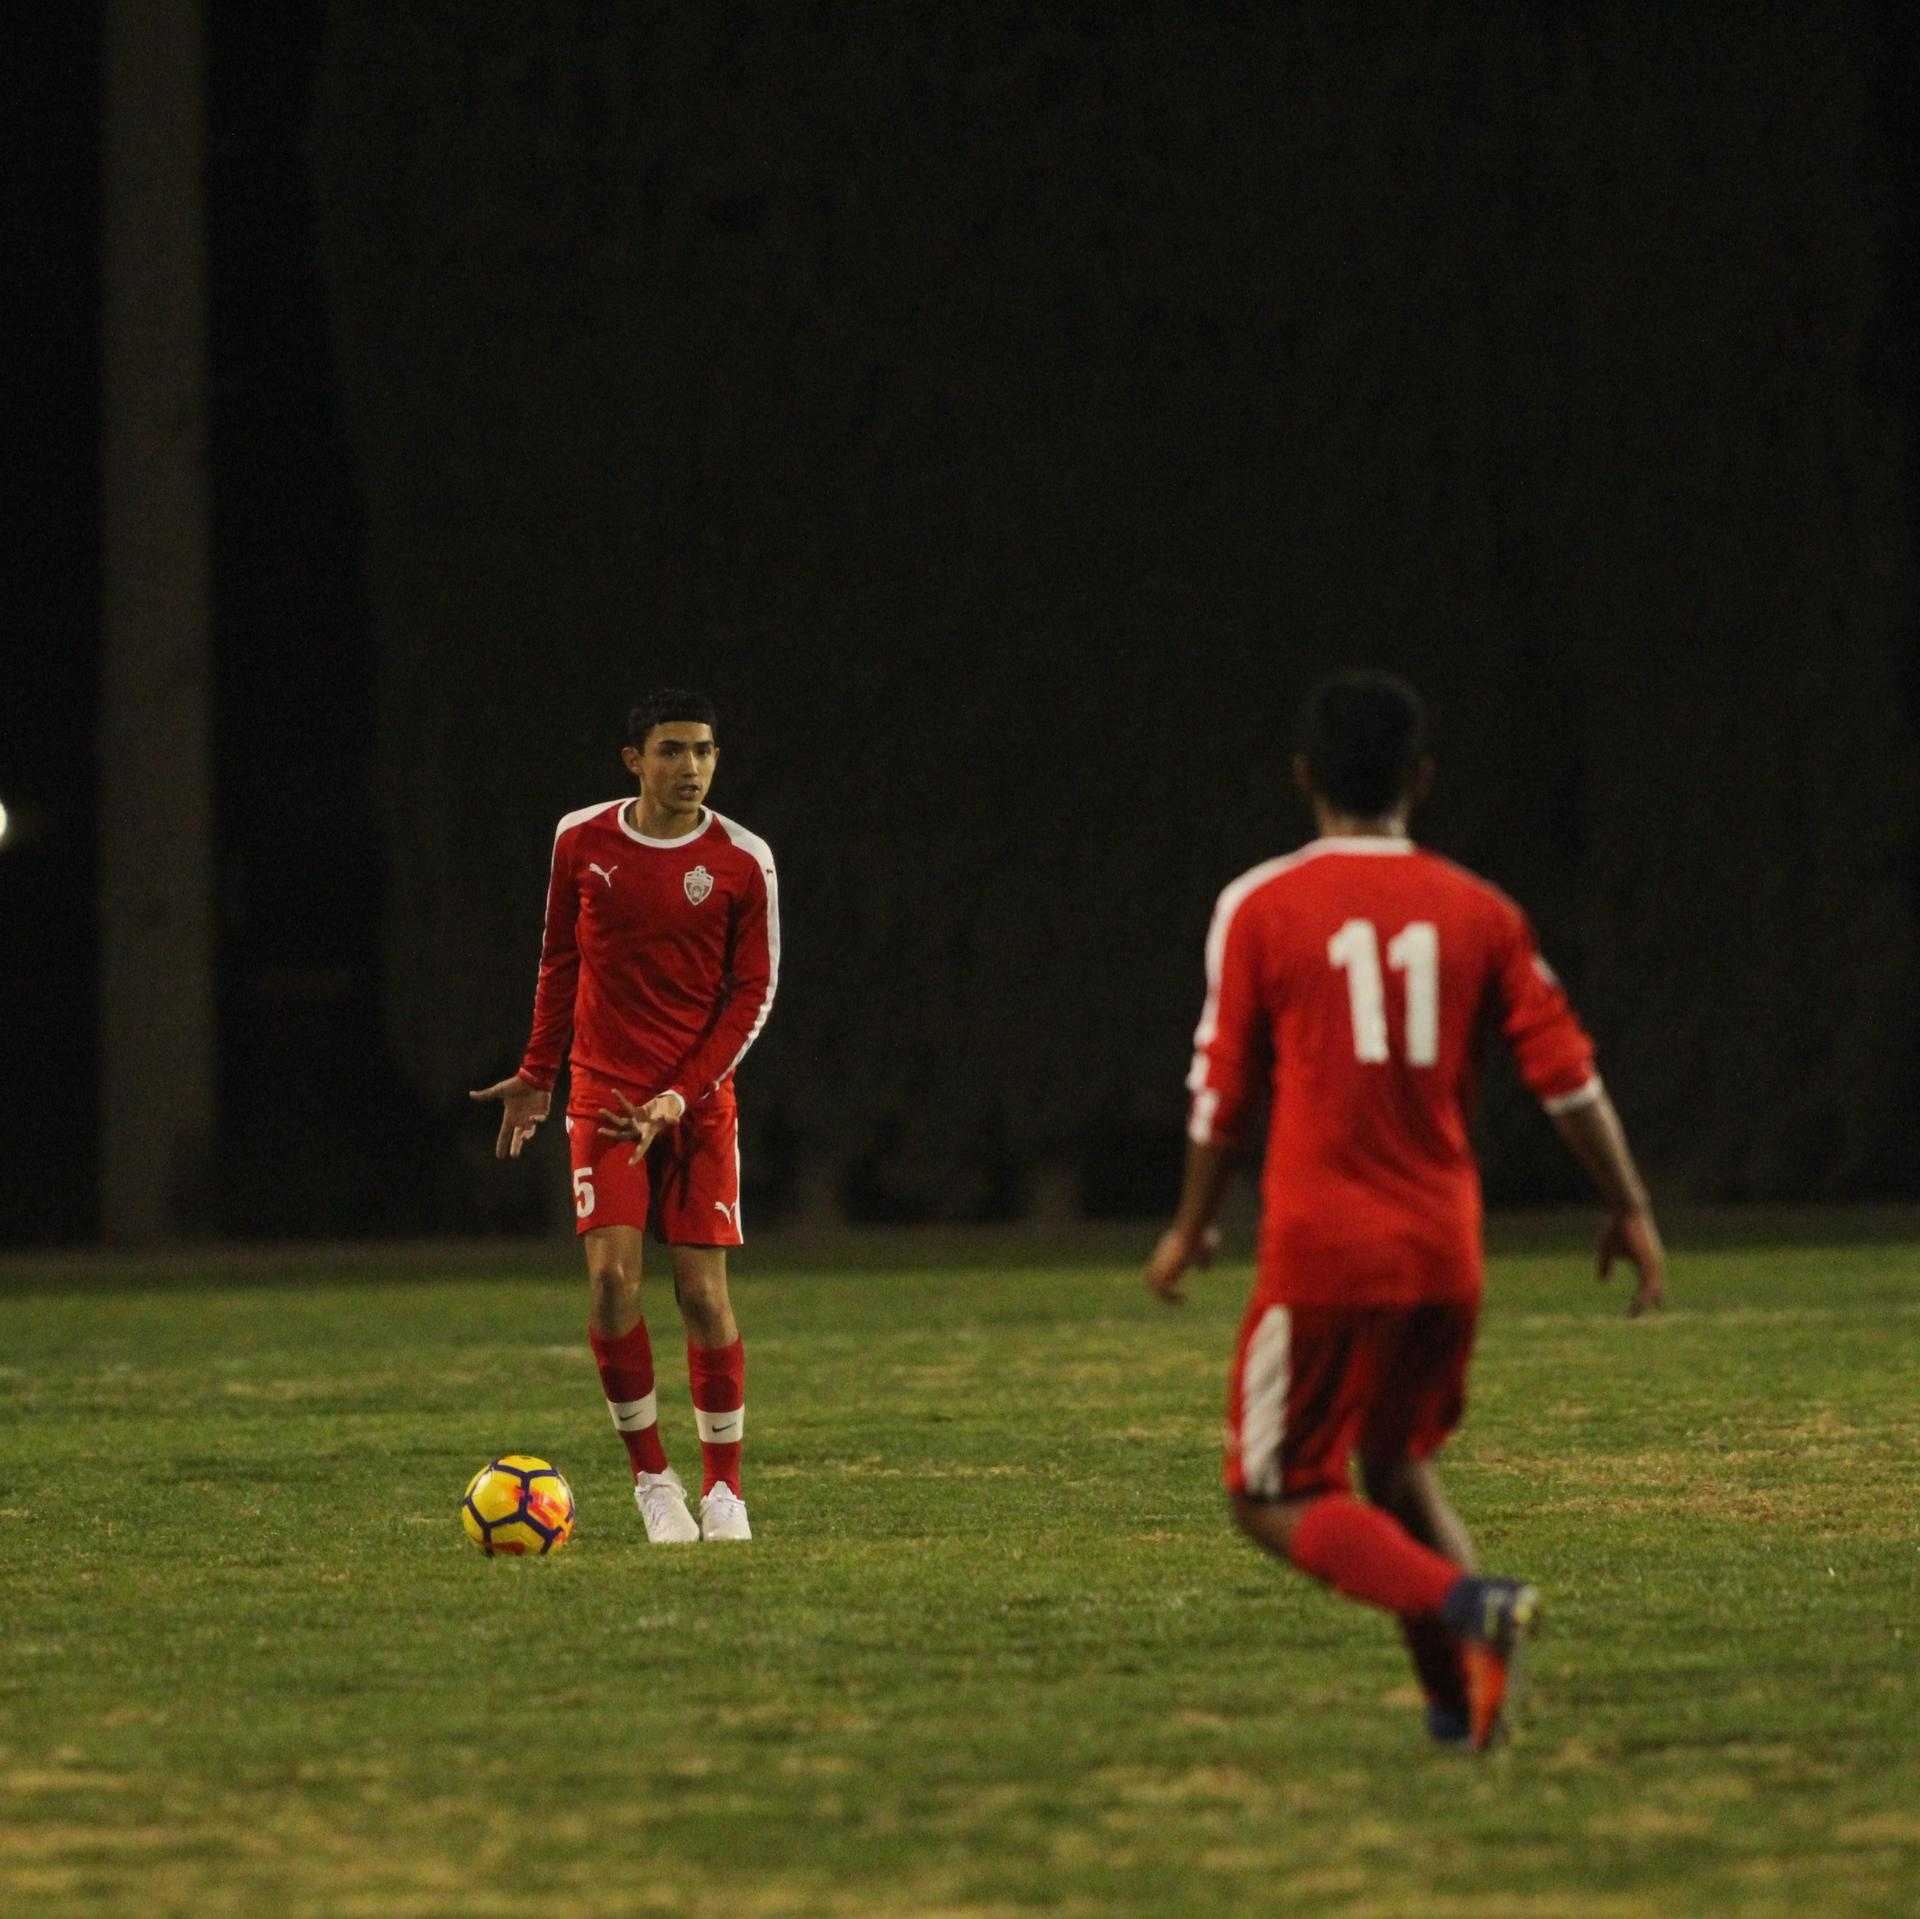 Edgar Campos with the ball